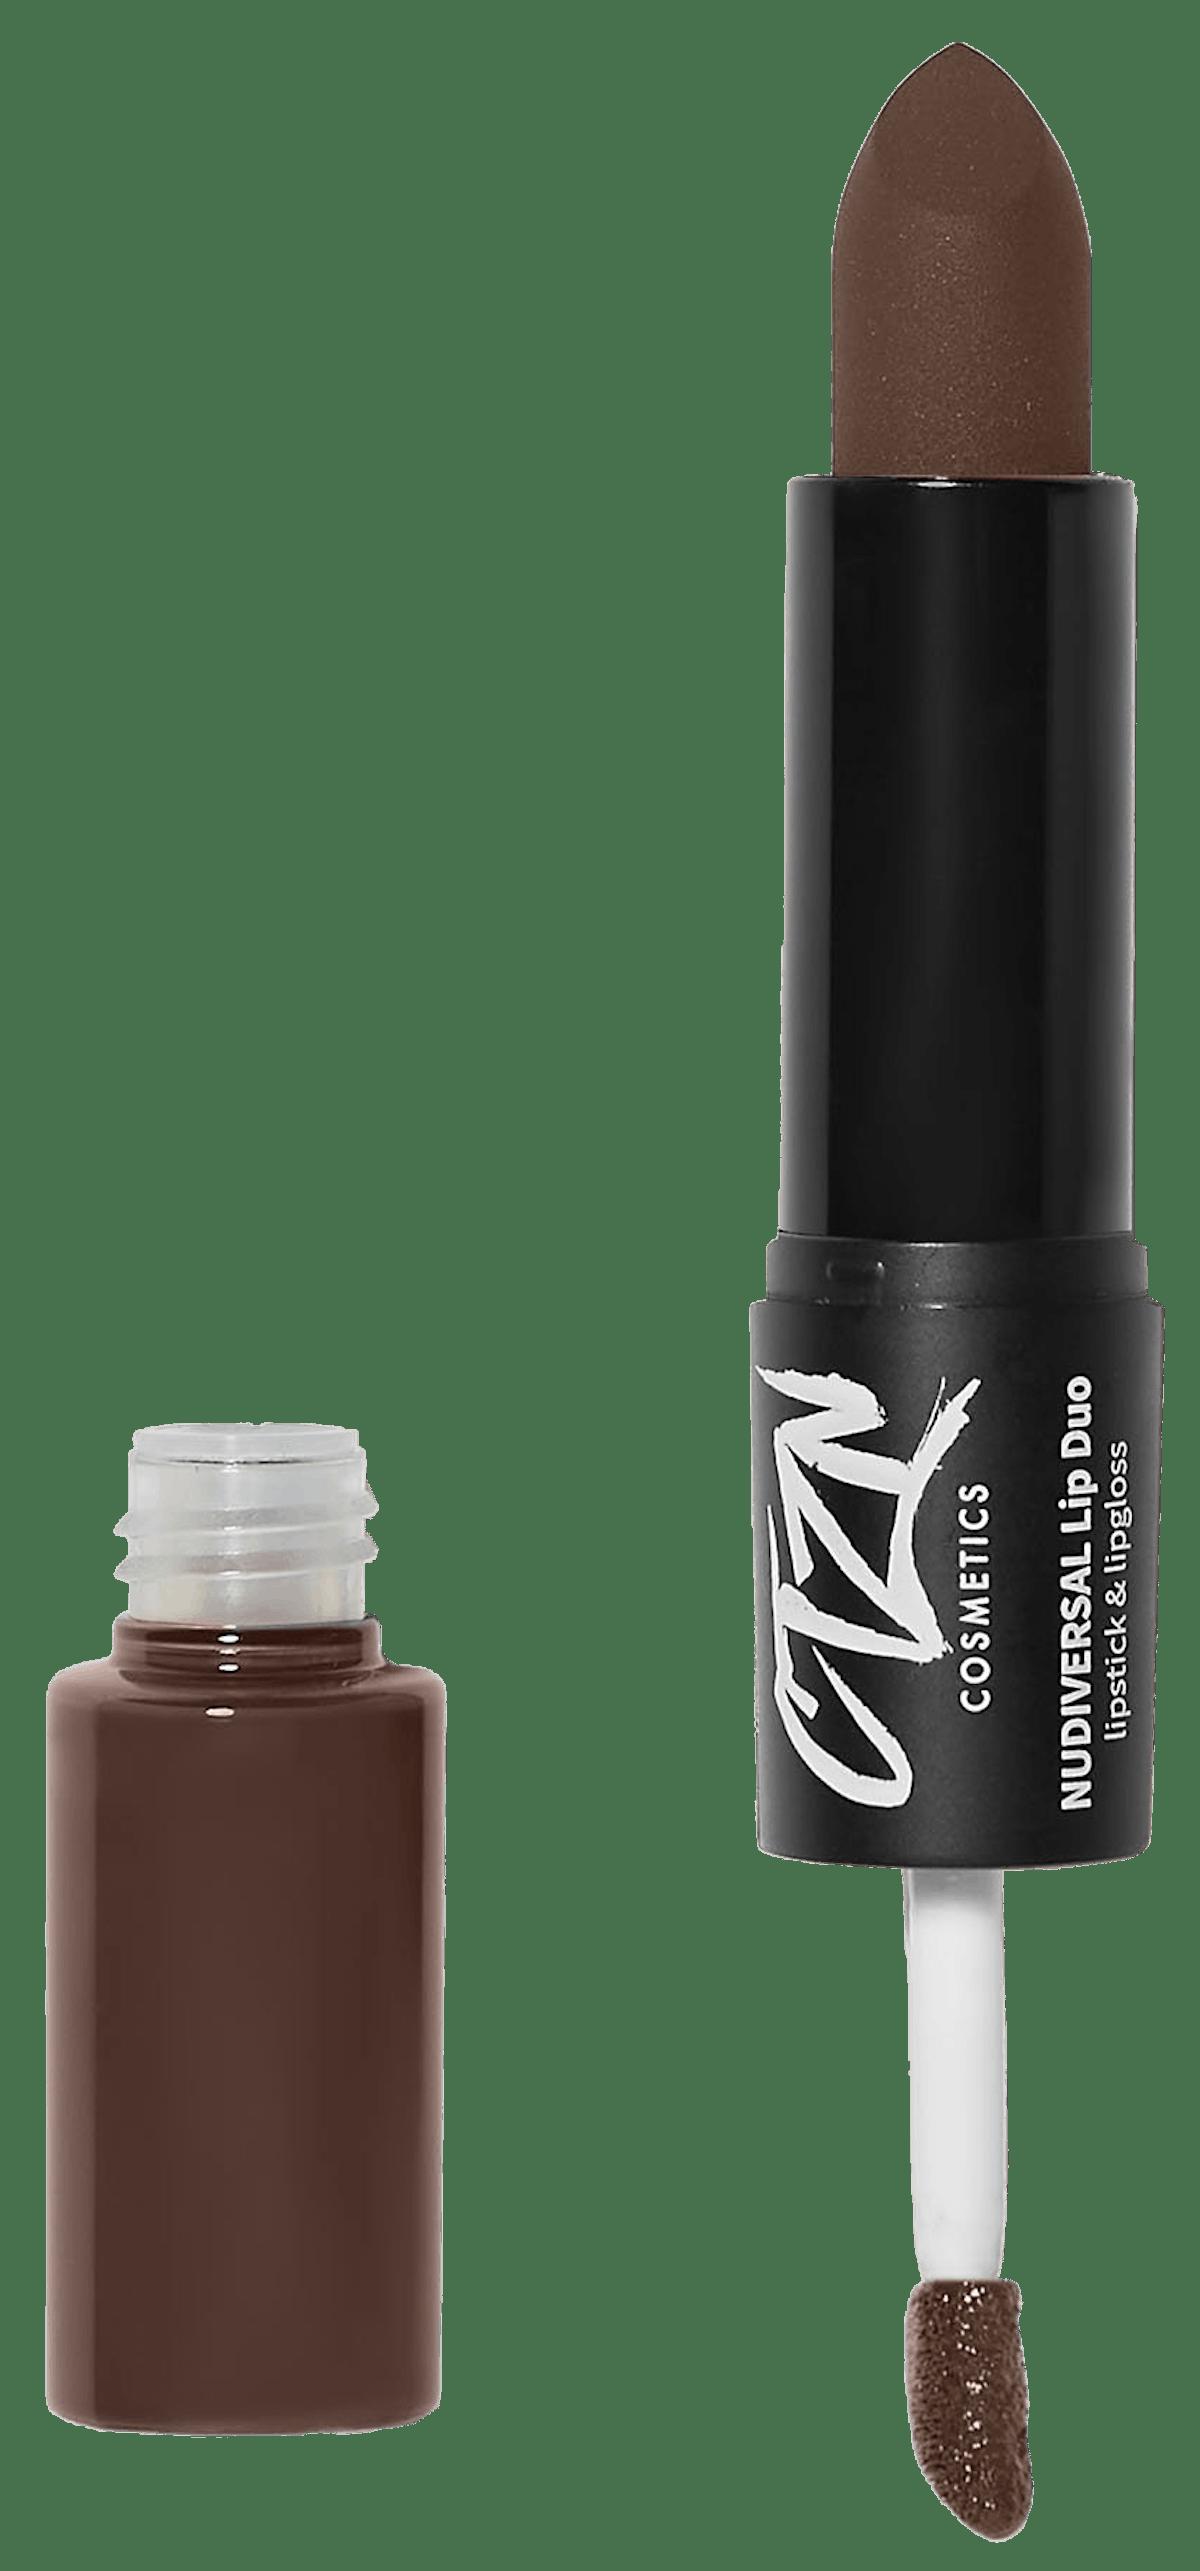 Nudiversal Lip Duo